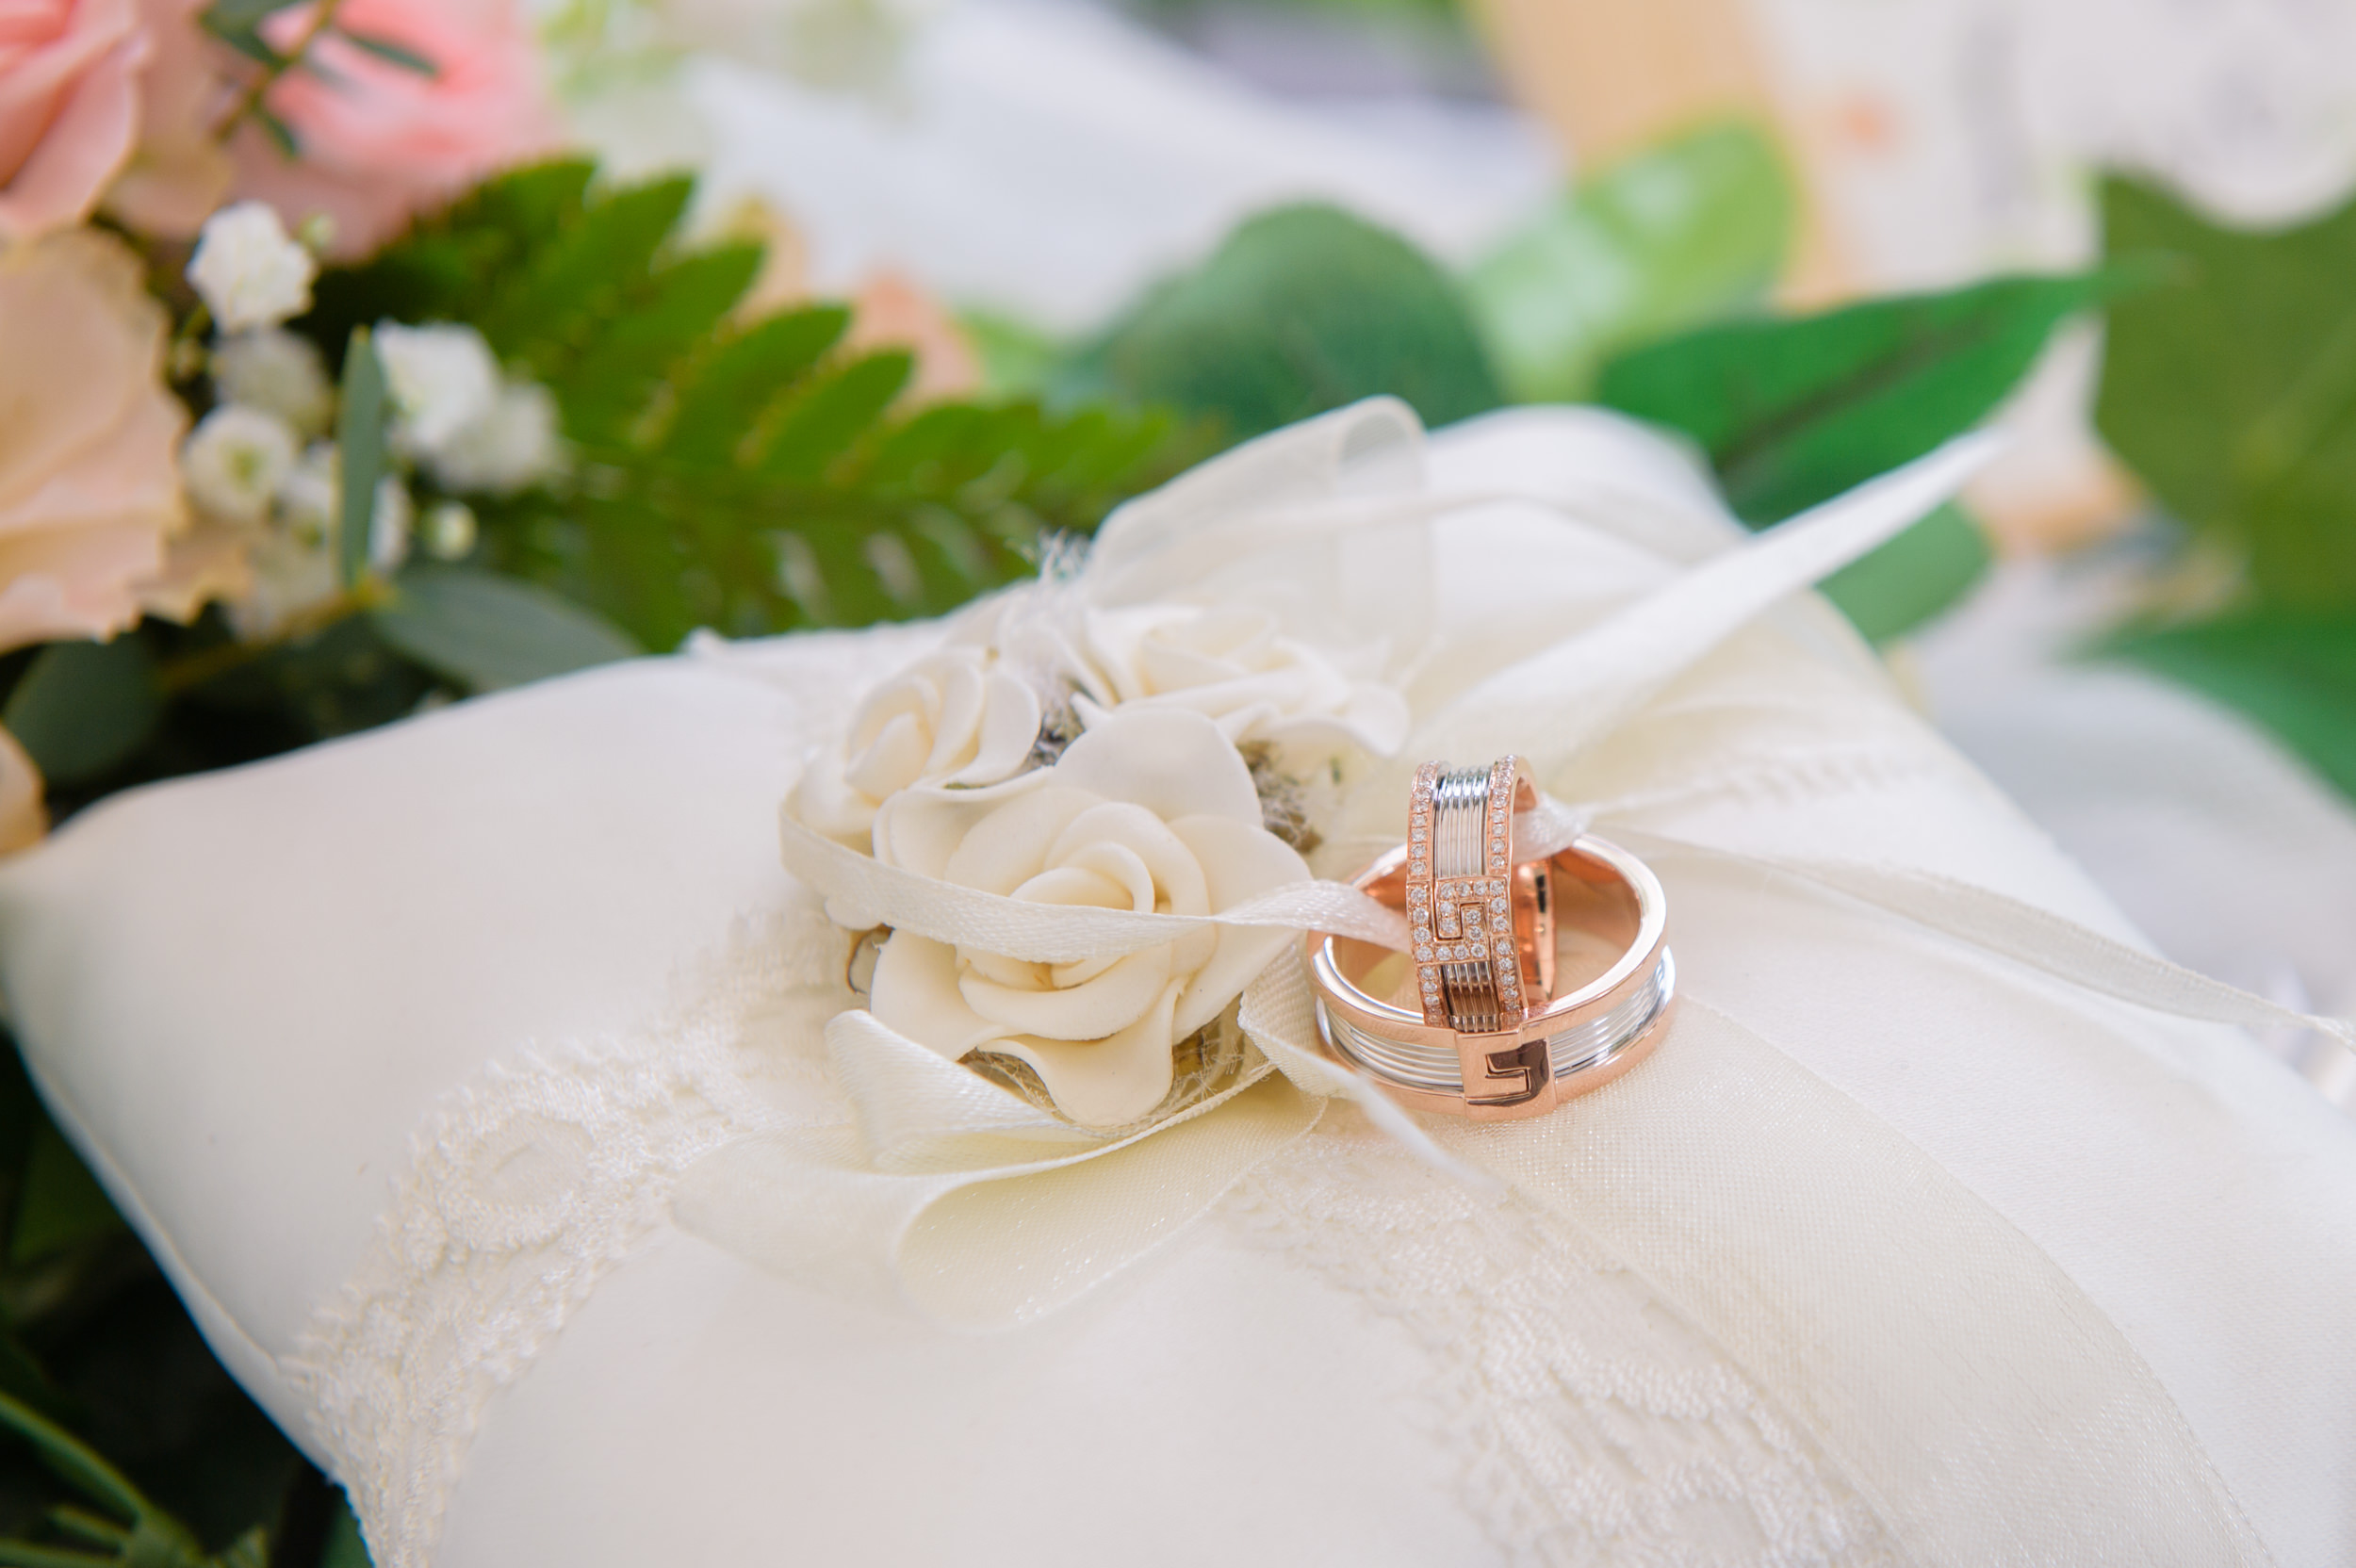 ROM Wedding Ring Bokelicious